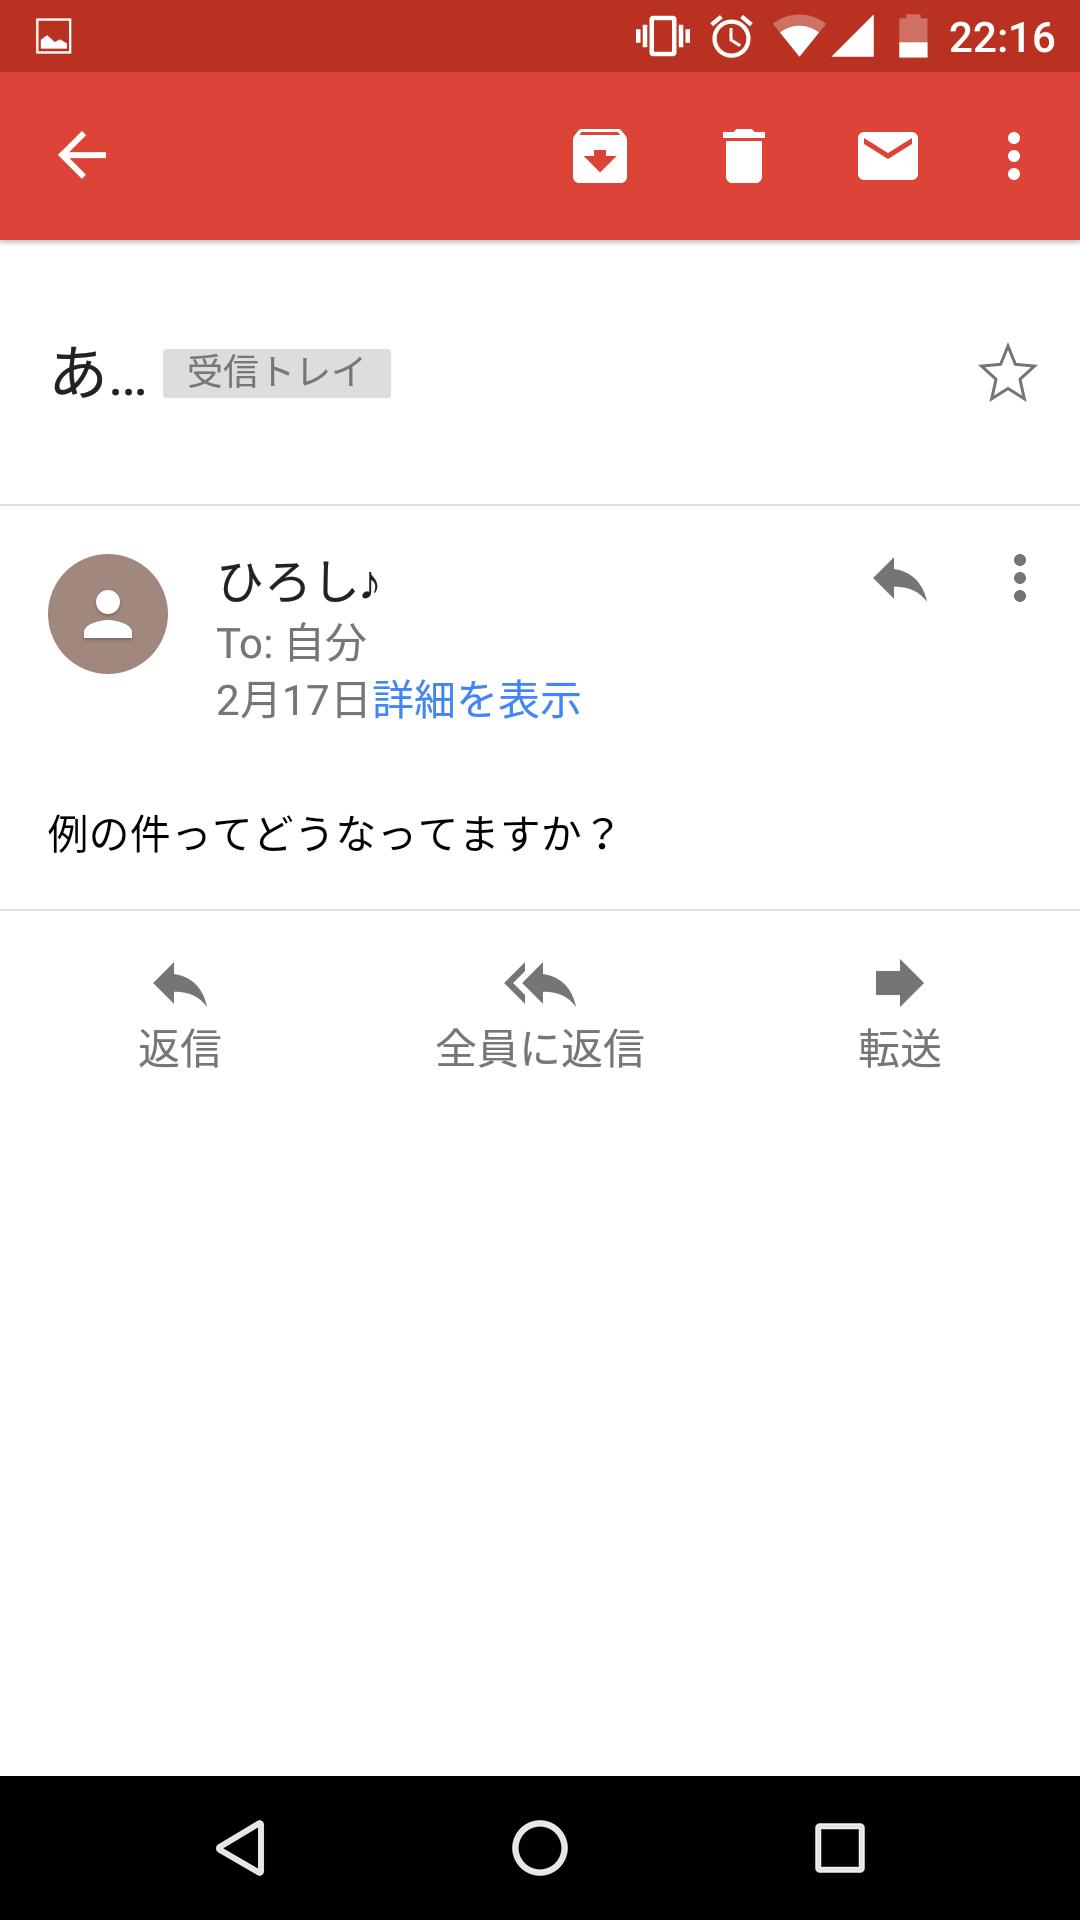 Screenshot_20160224-221659